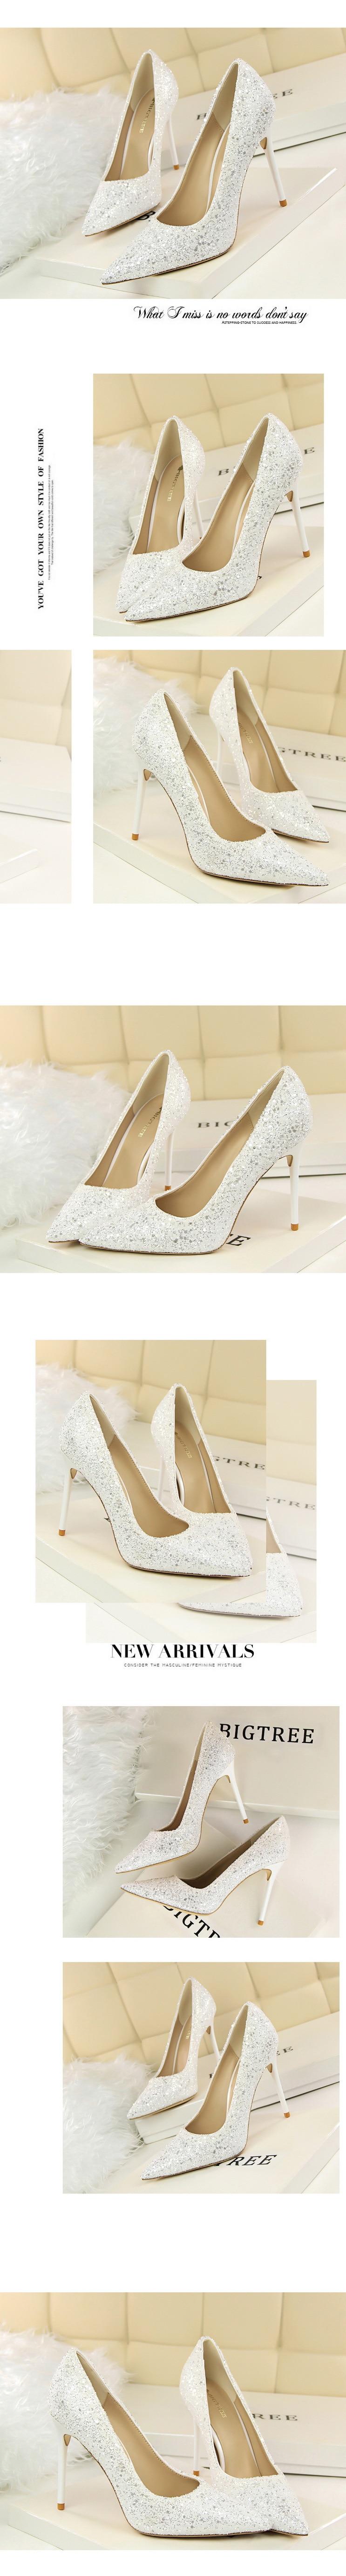 Sapatos femininos de salto alto boca rasa